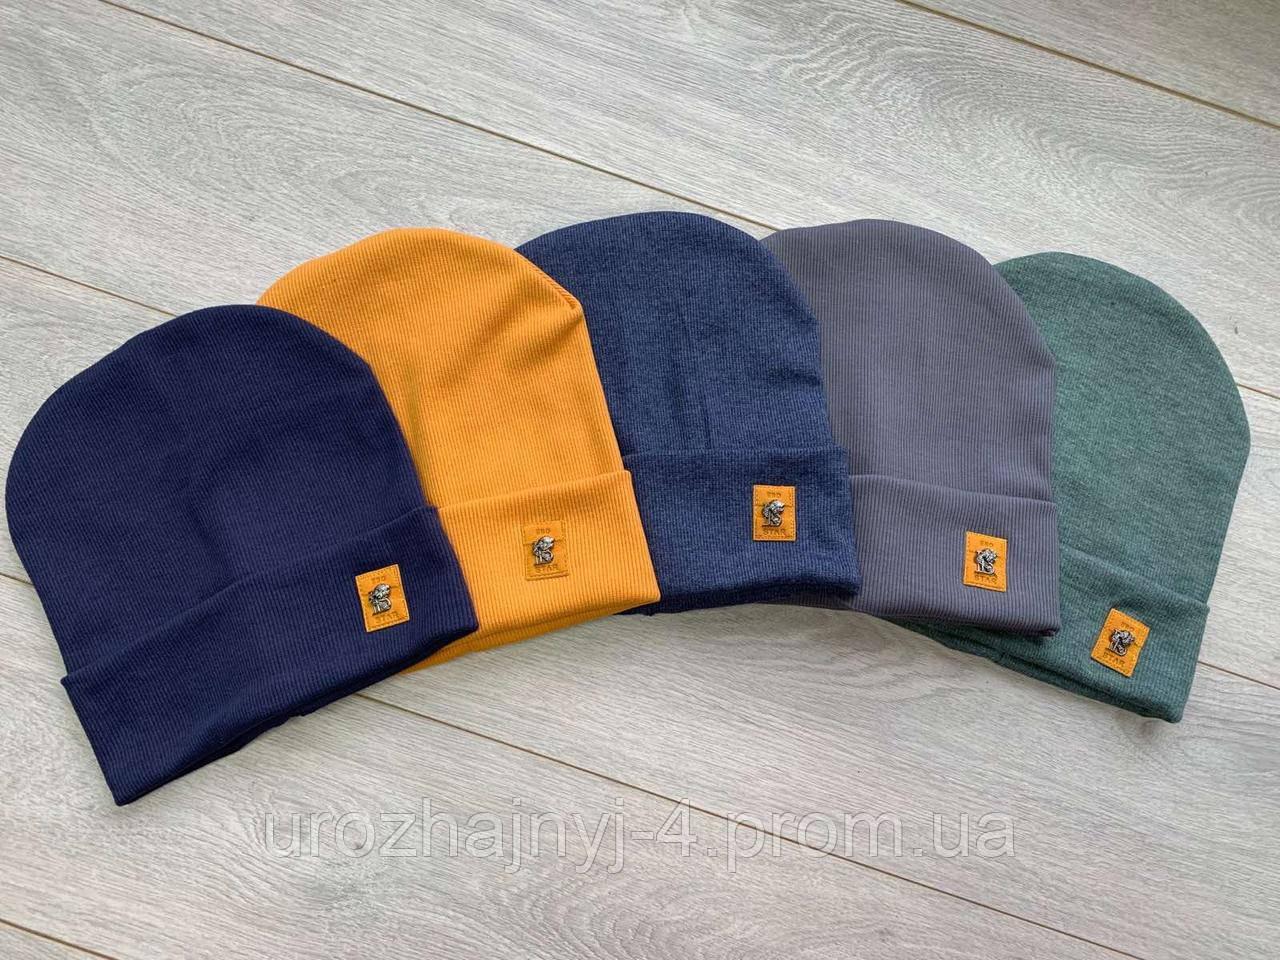 Трикотажная шапка на подкладке х/б р52-54 упаковка 5шт